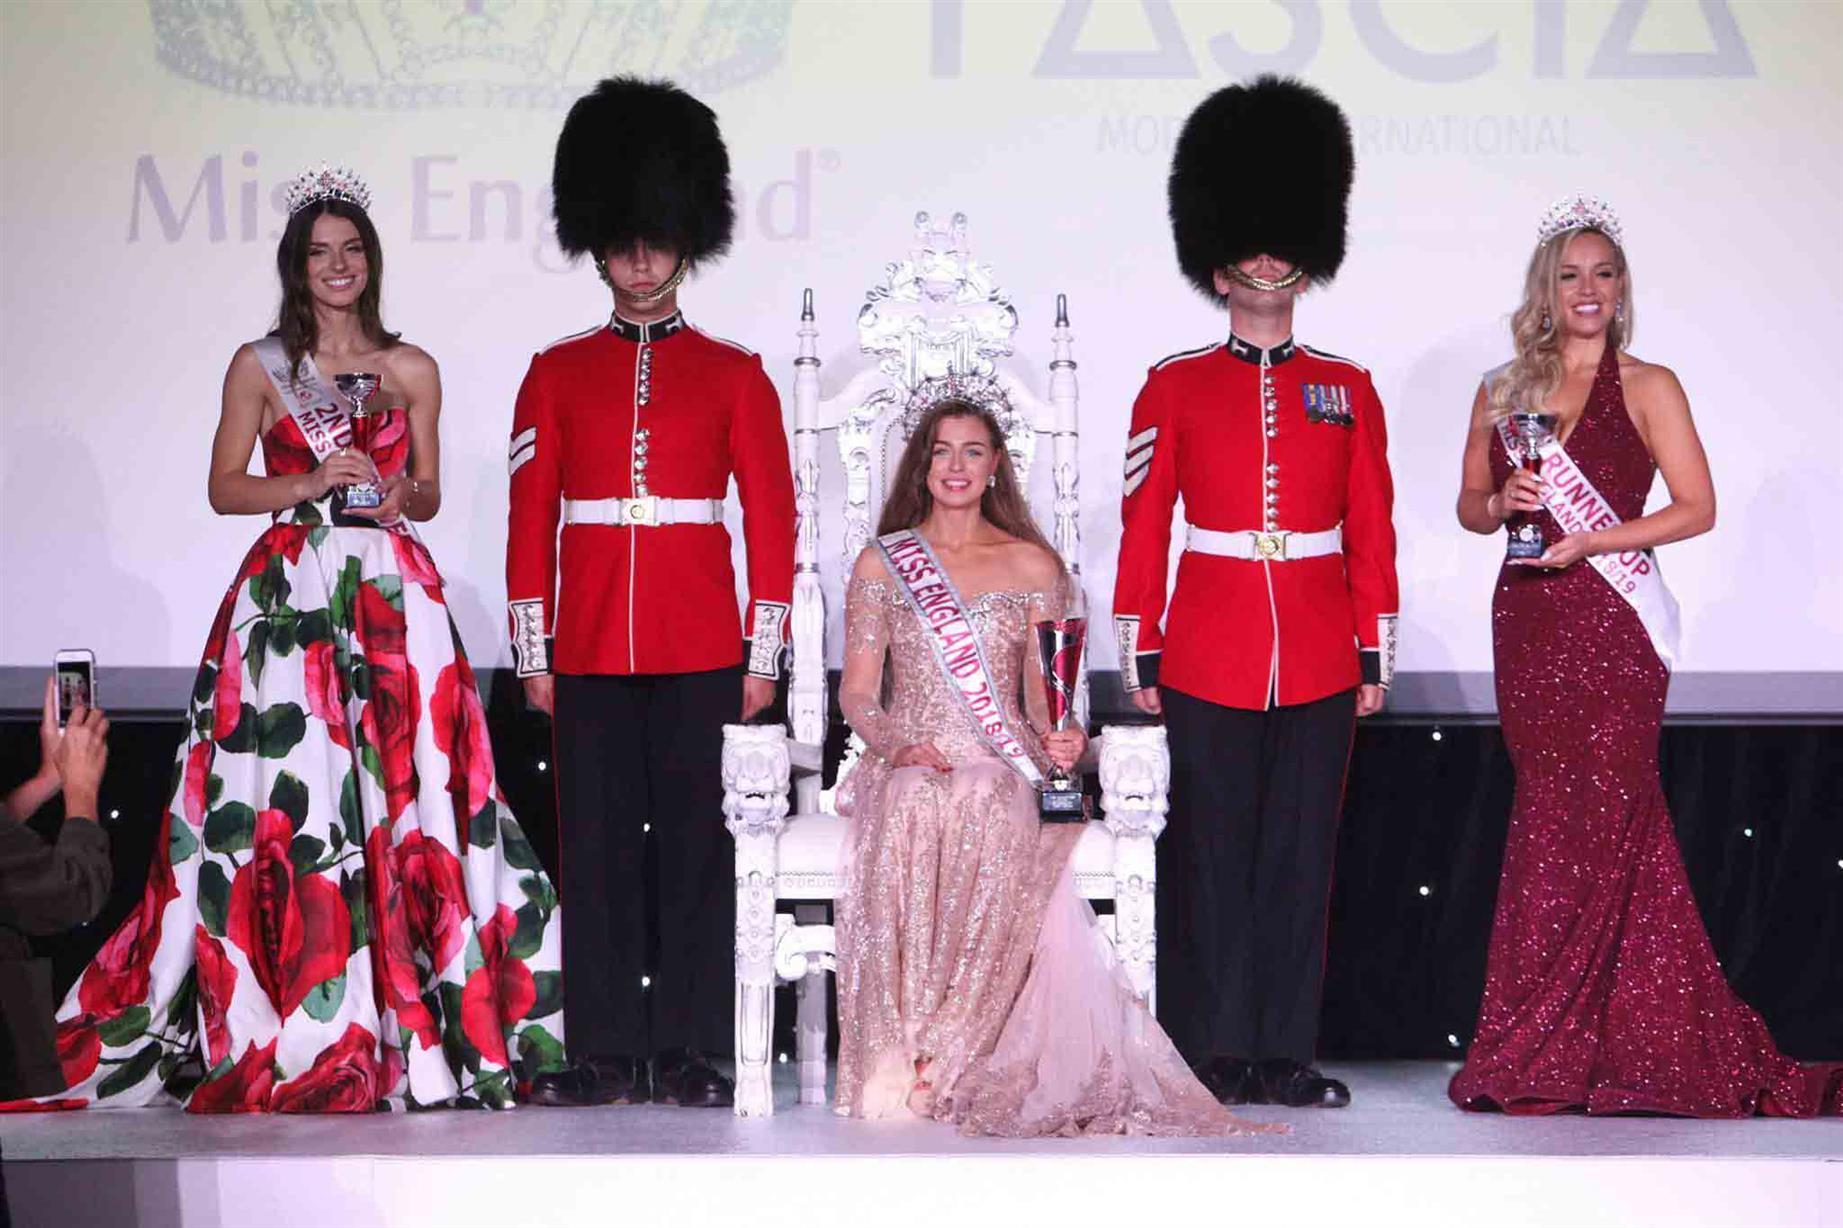 Miss England 2019 Meet the Contestants